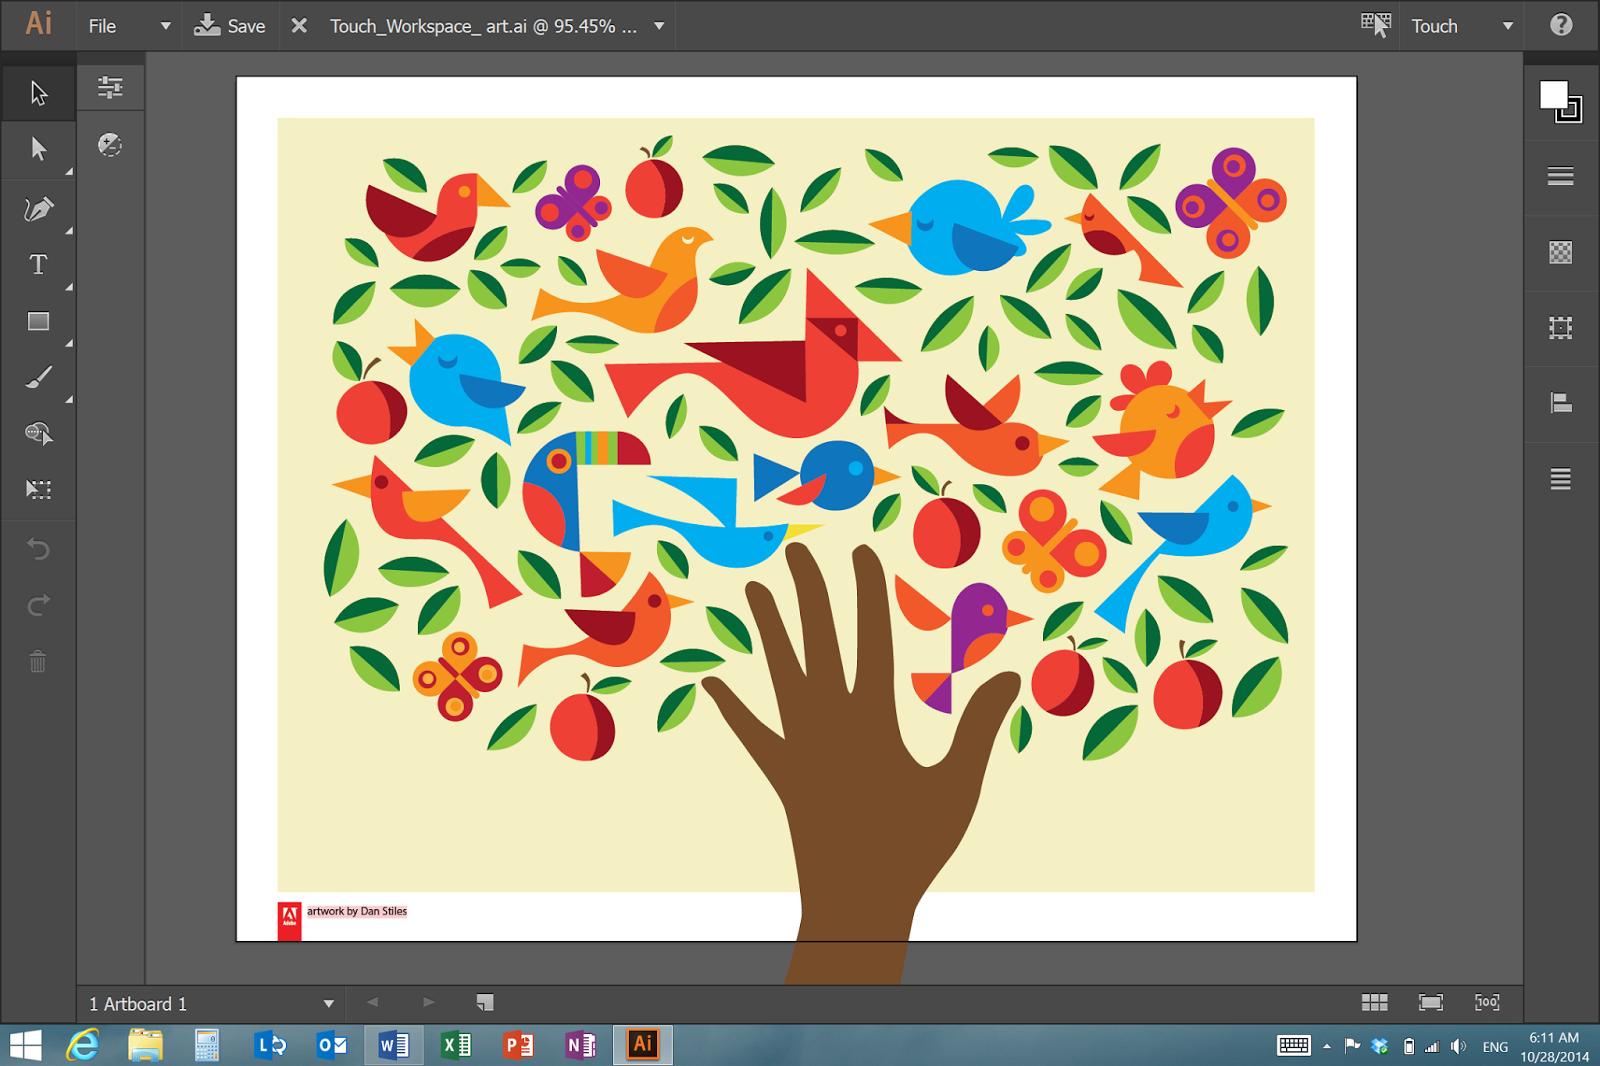 Adobe Illustrator 2020 - download in one click. Virus free.